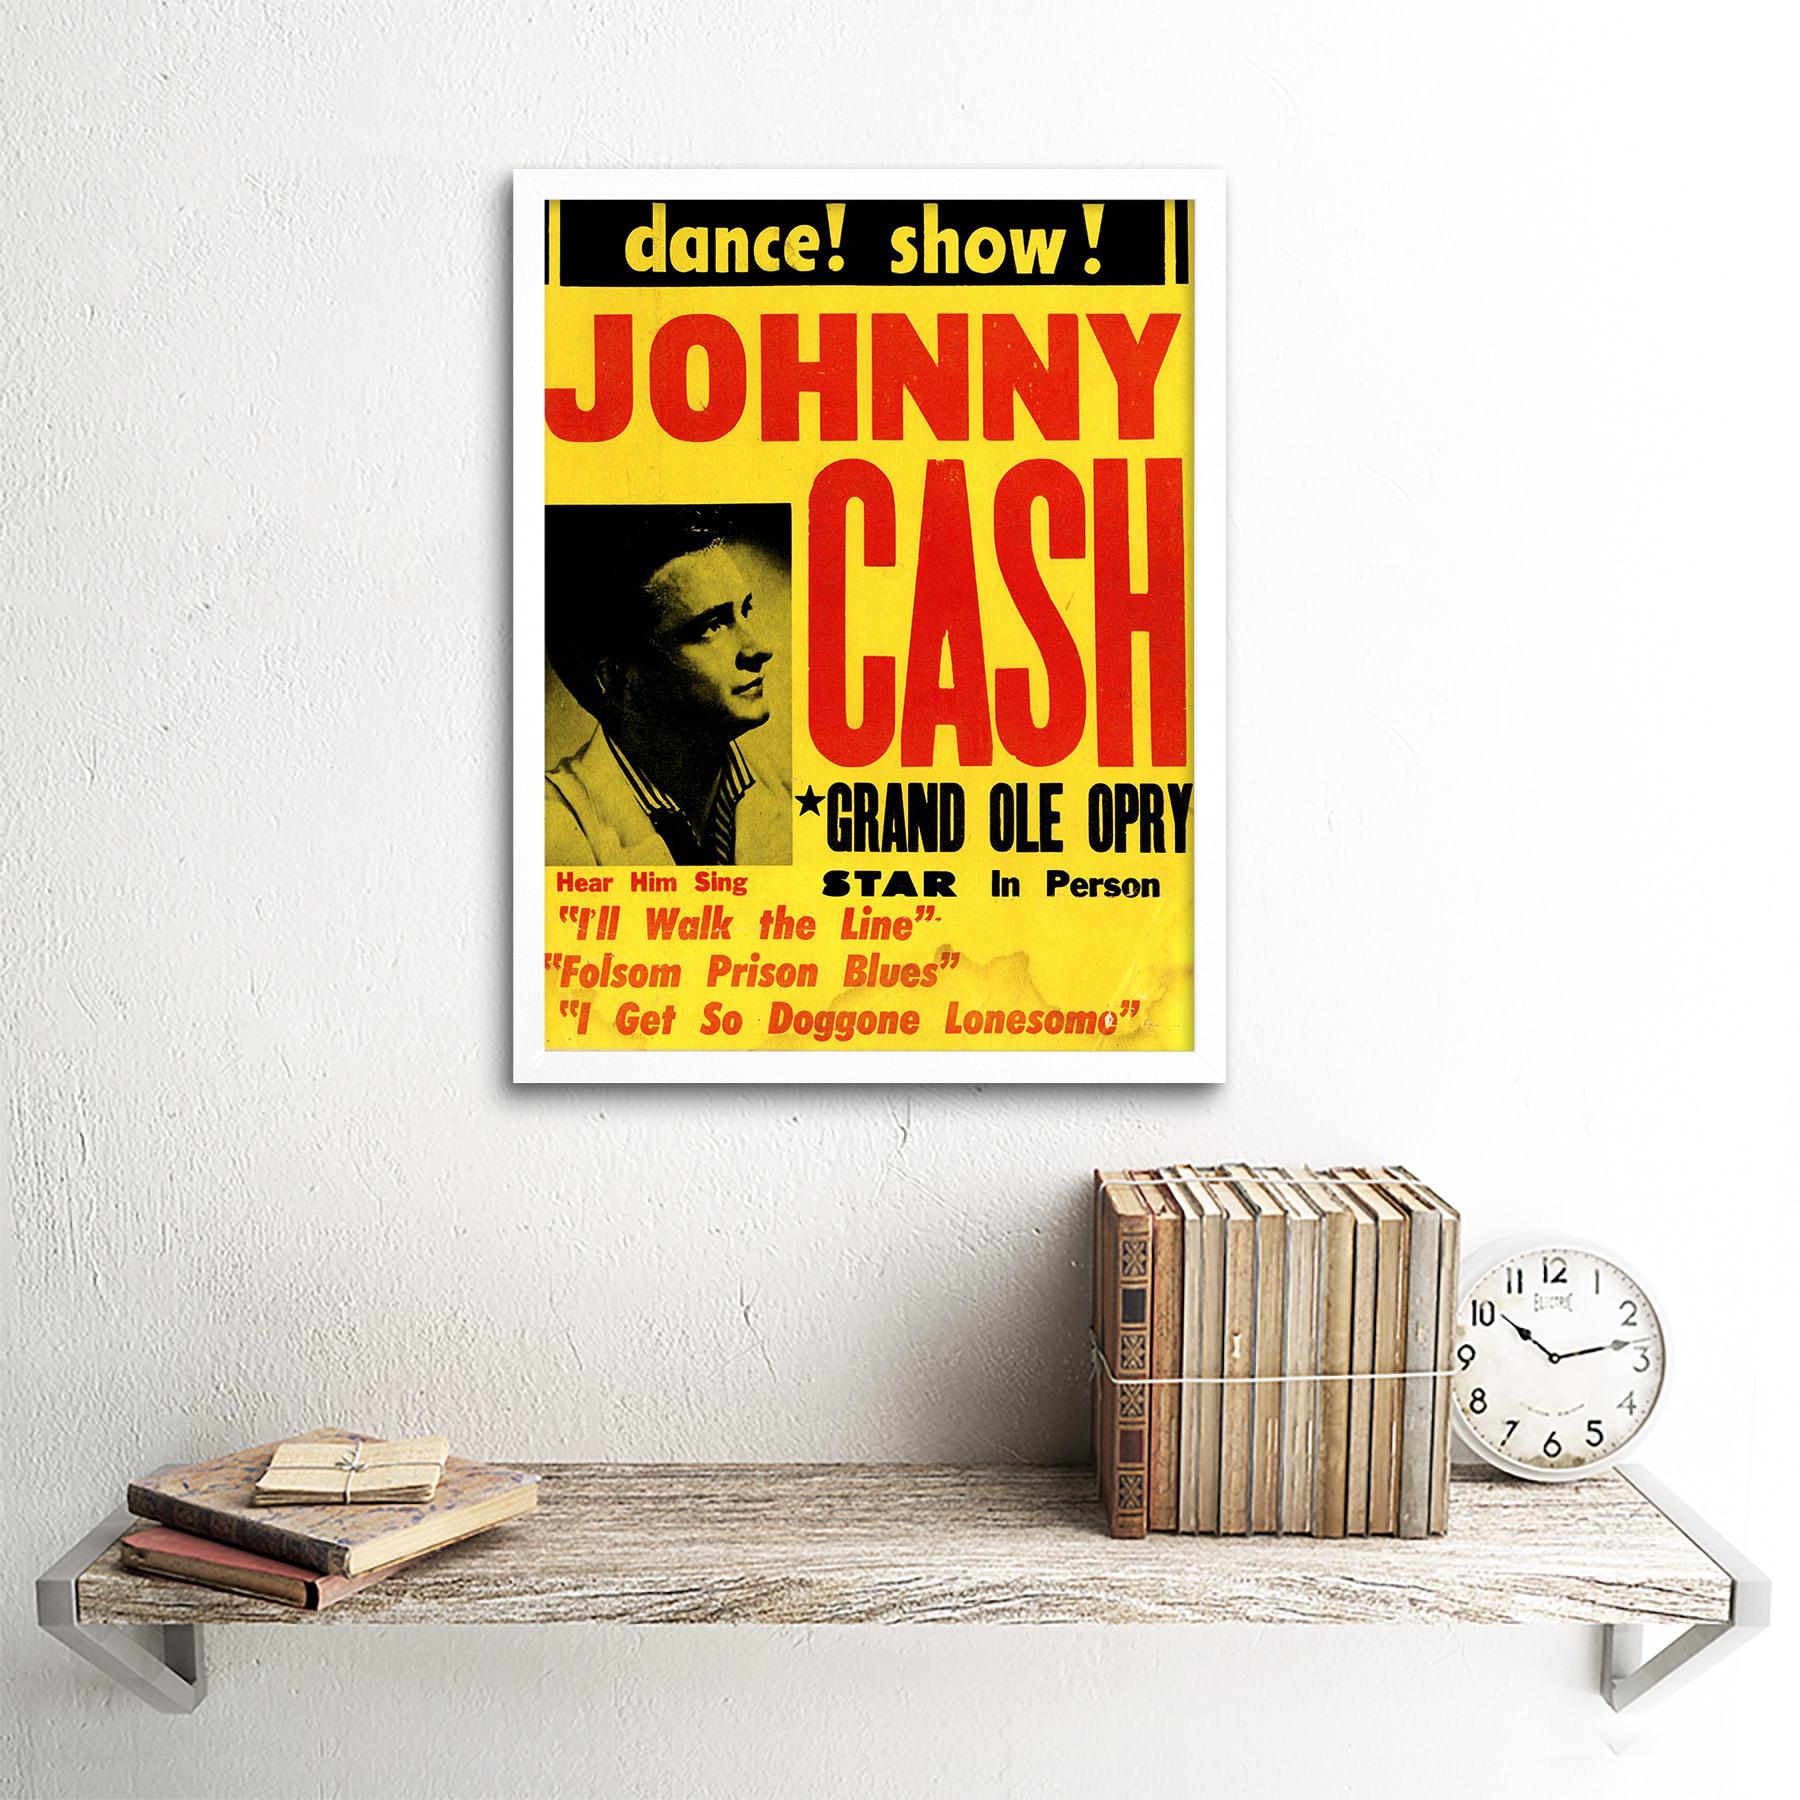 Music Concert Advert Johnny Cash Grand Ole Opry 12X16 Inch Framed Art Print